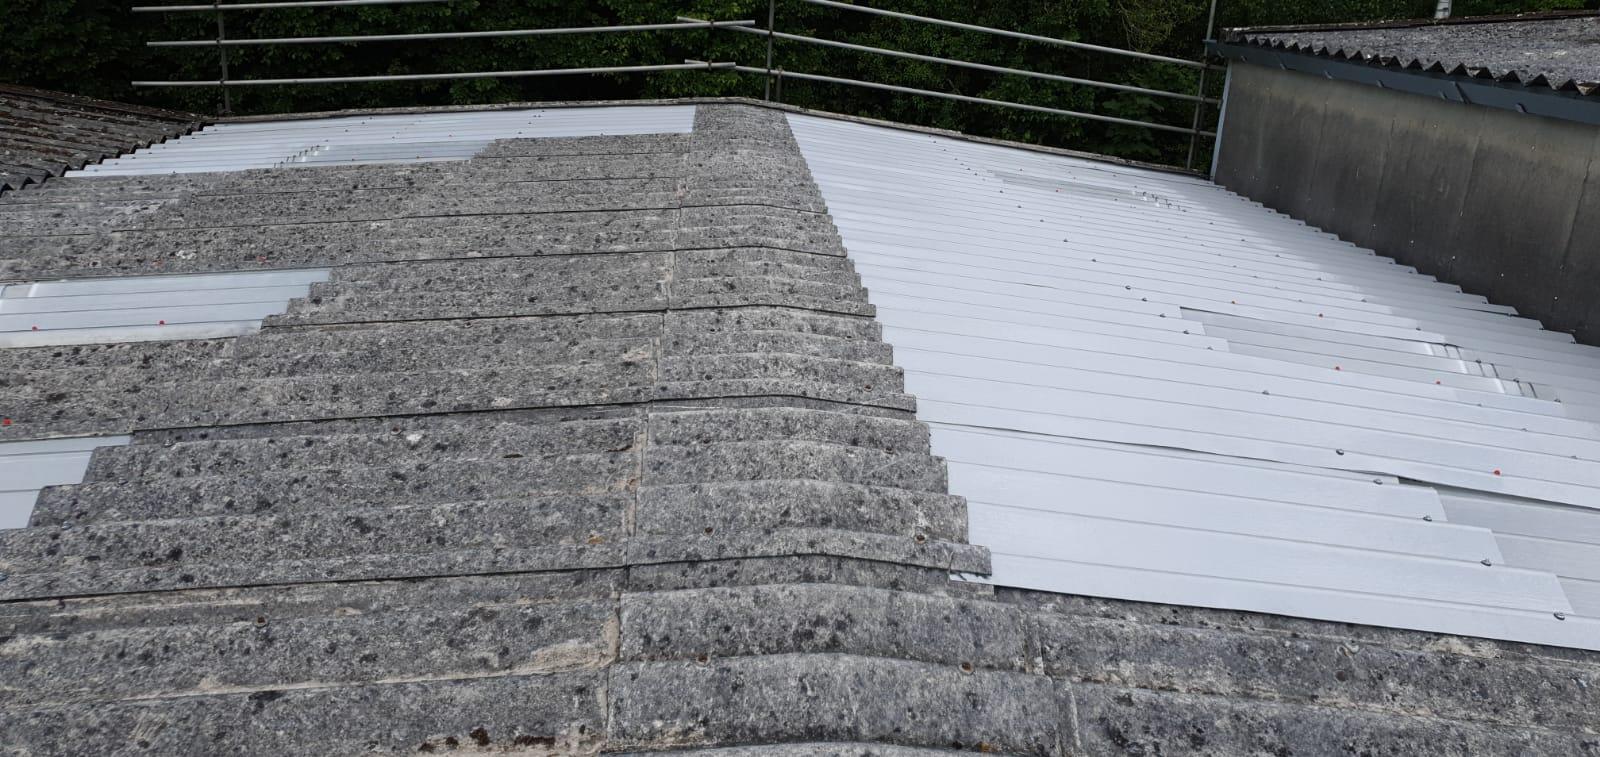 Repair to Gym roof in Pulborough, West Sussex